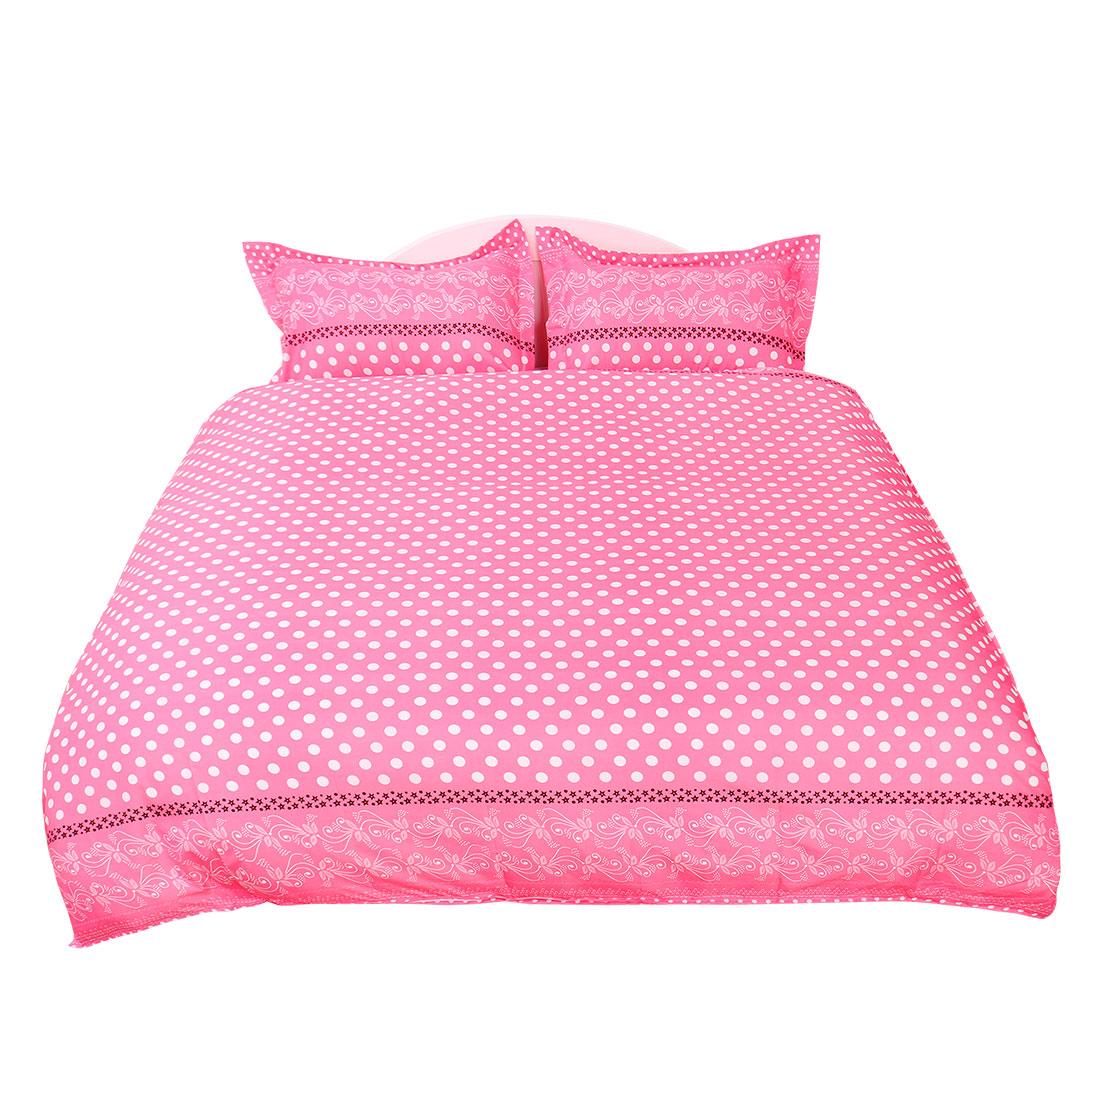 Dots Pattern Duvet Cover Pillowcase Quilt Cover Bedding Set Double Size